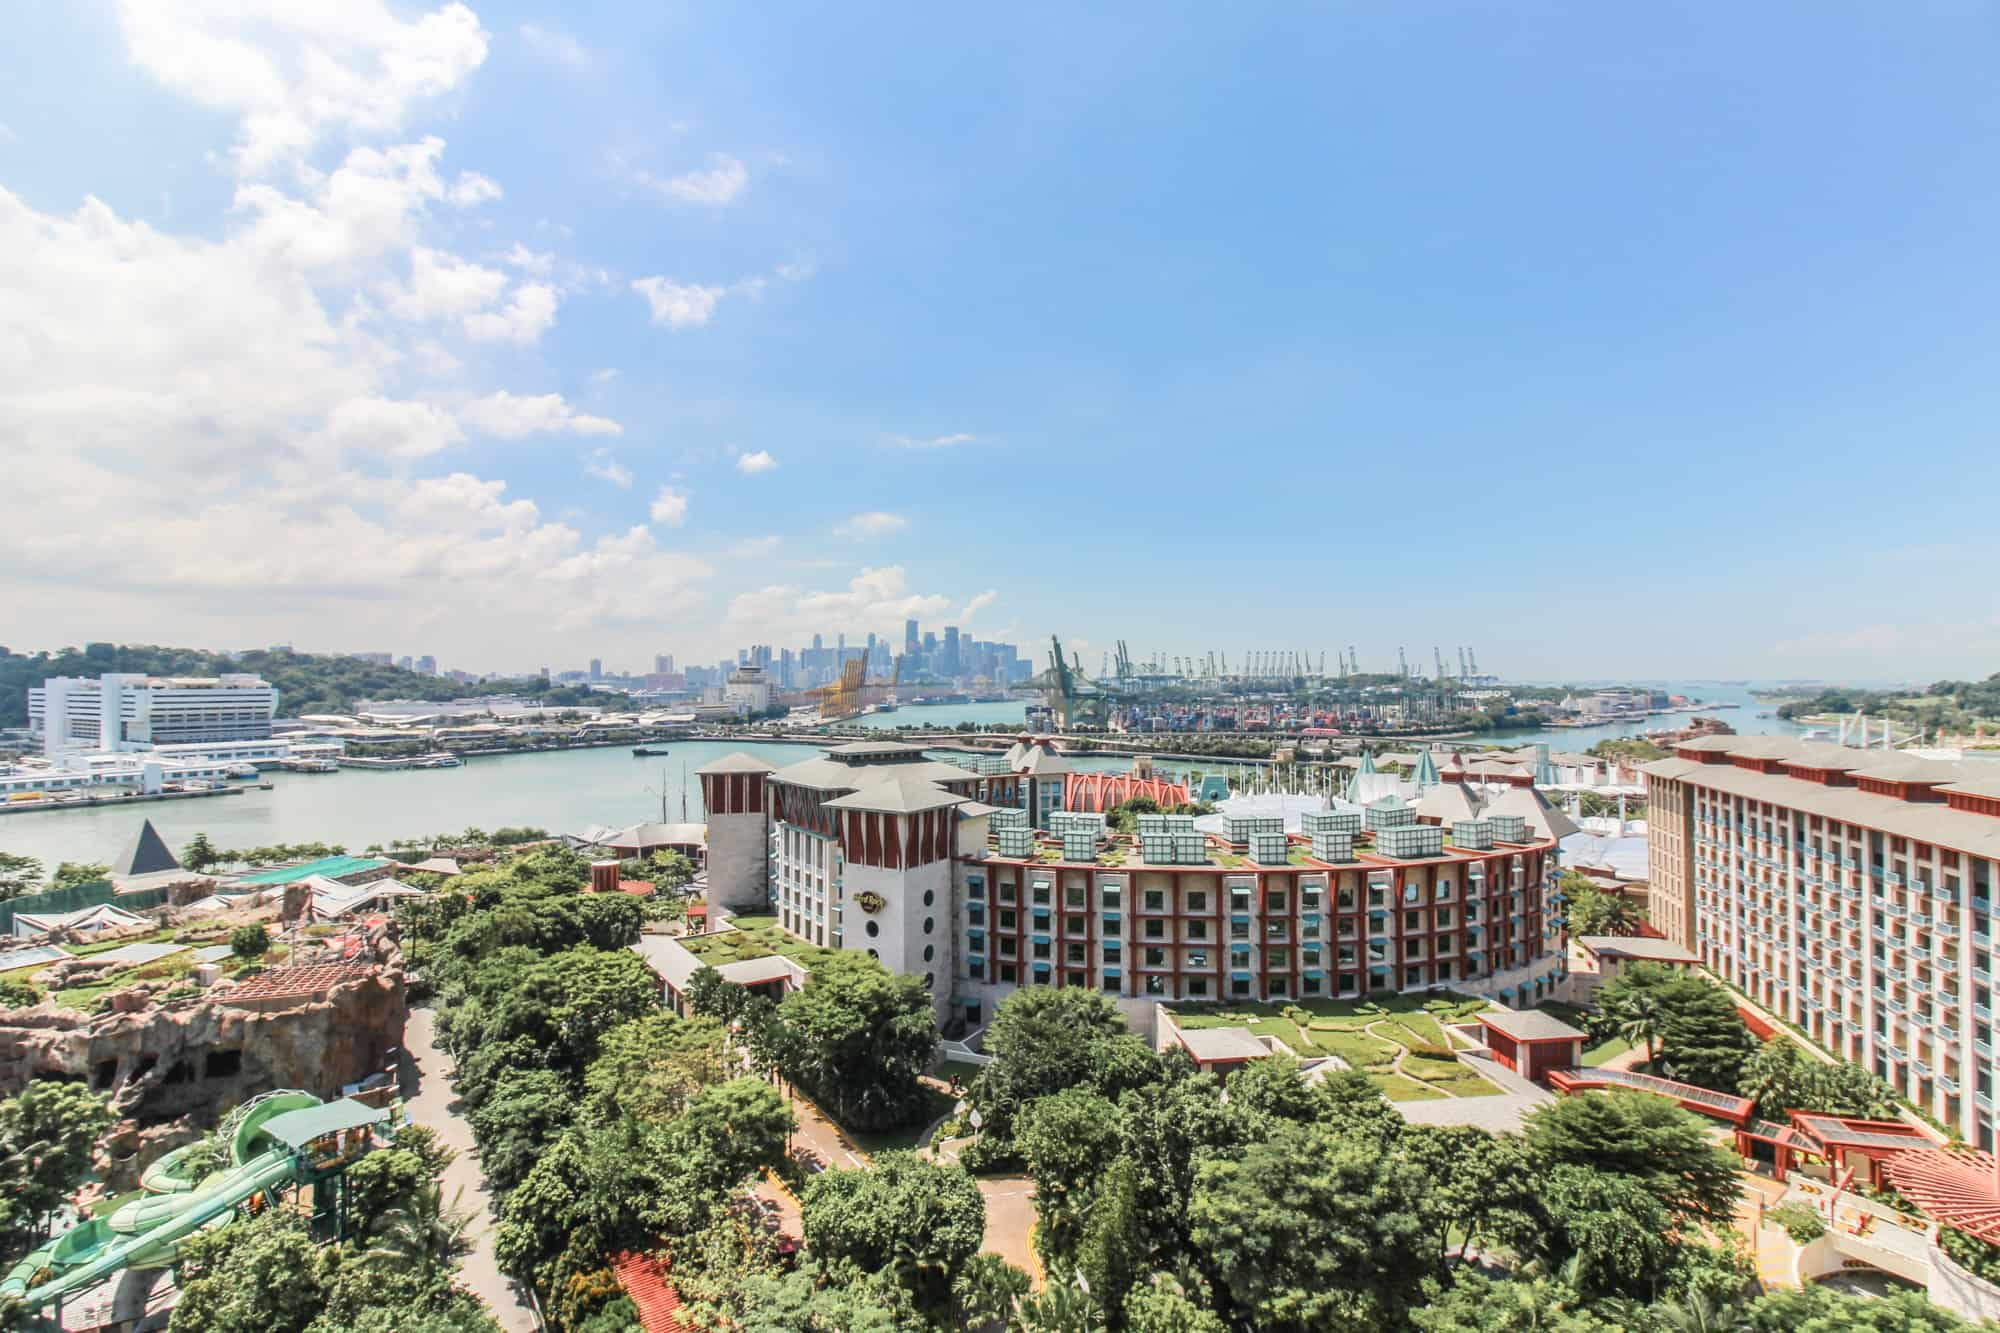 Foto-Highlights in Singapur: Sentosa